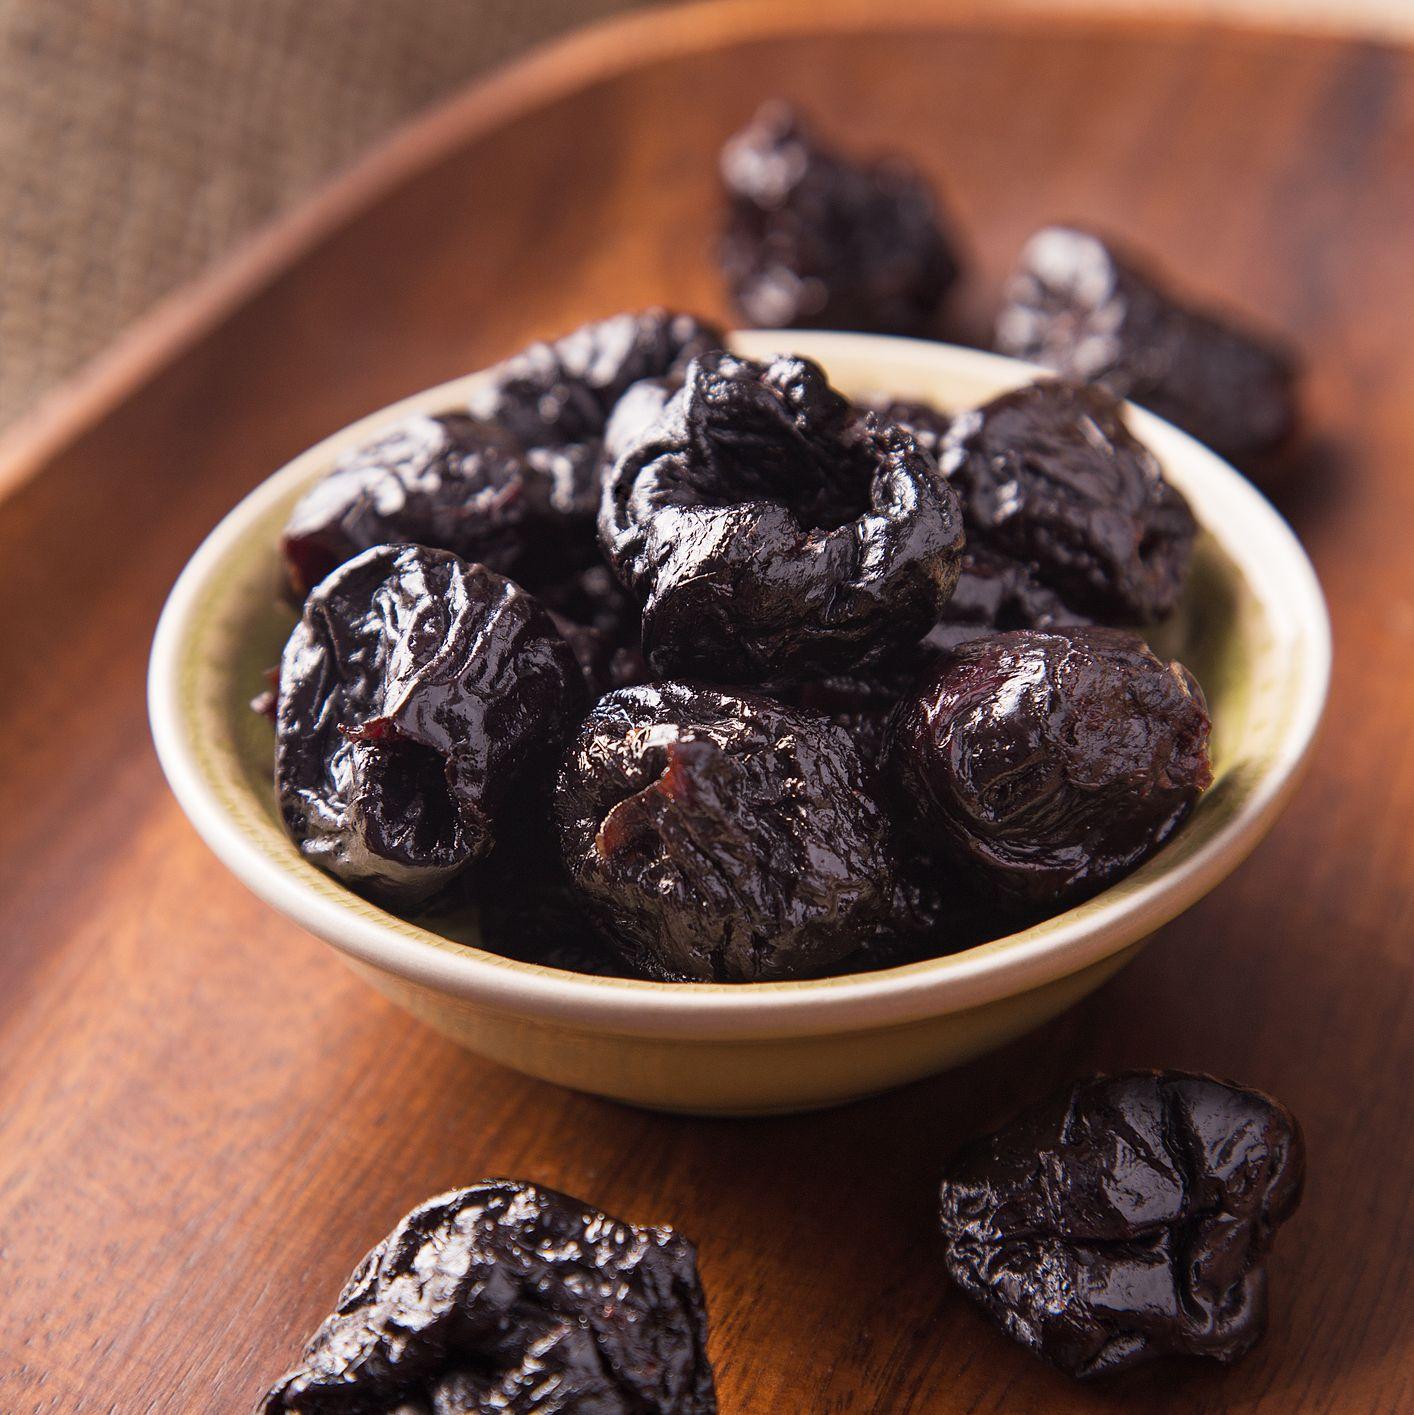 Superfoods - Prunes